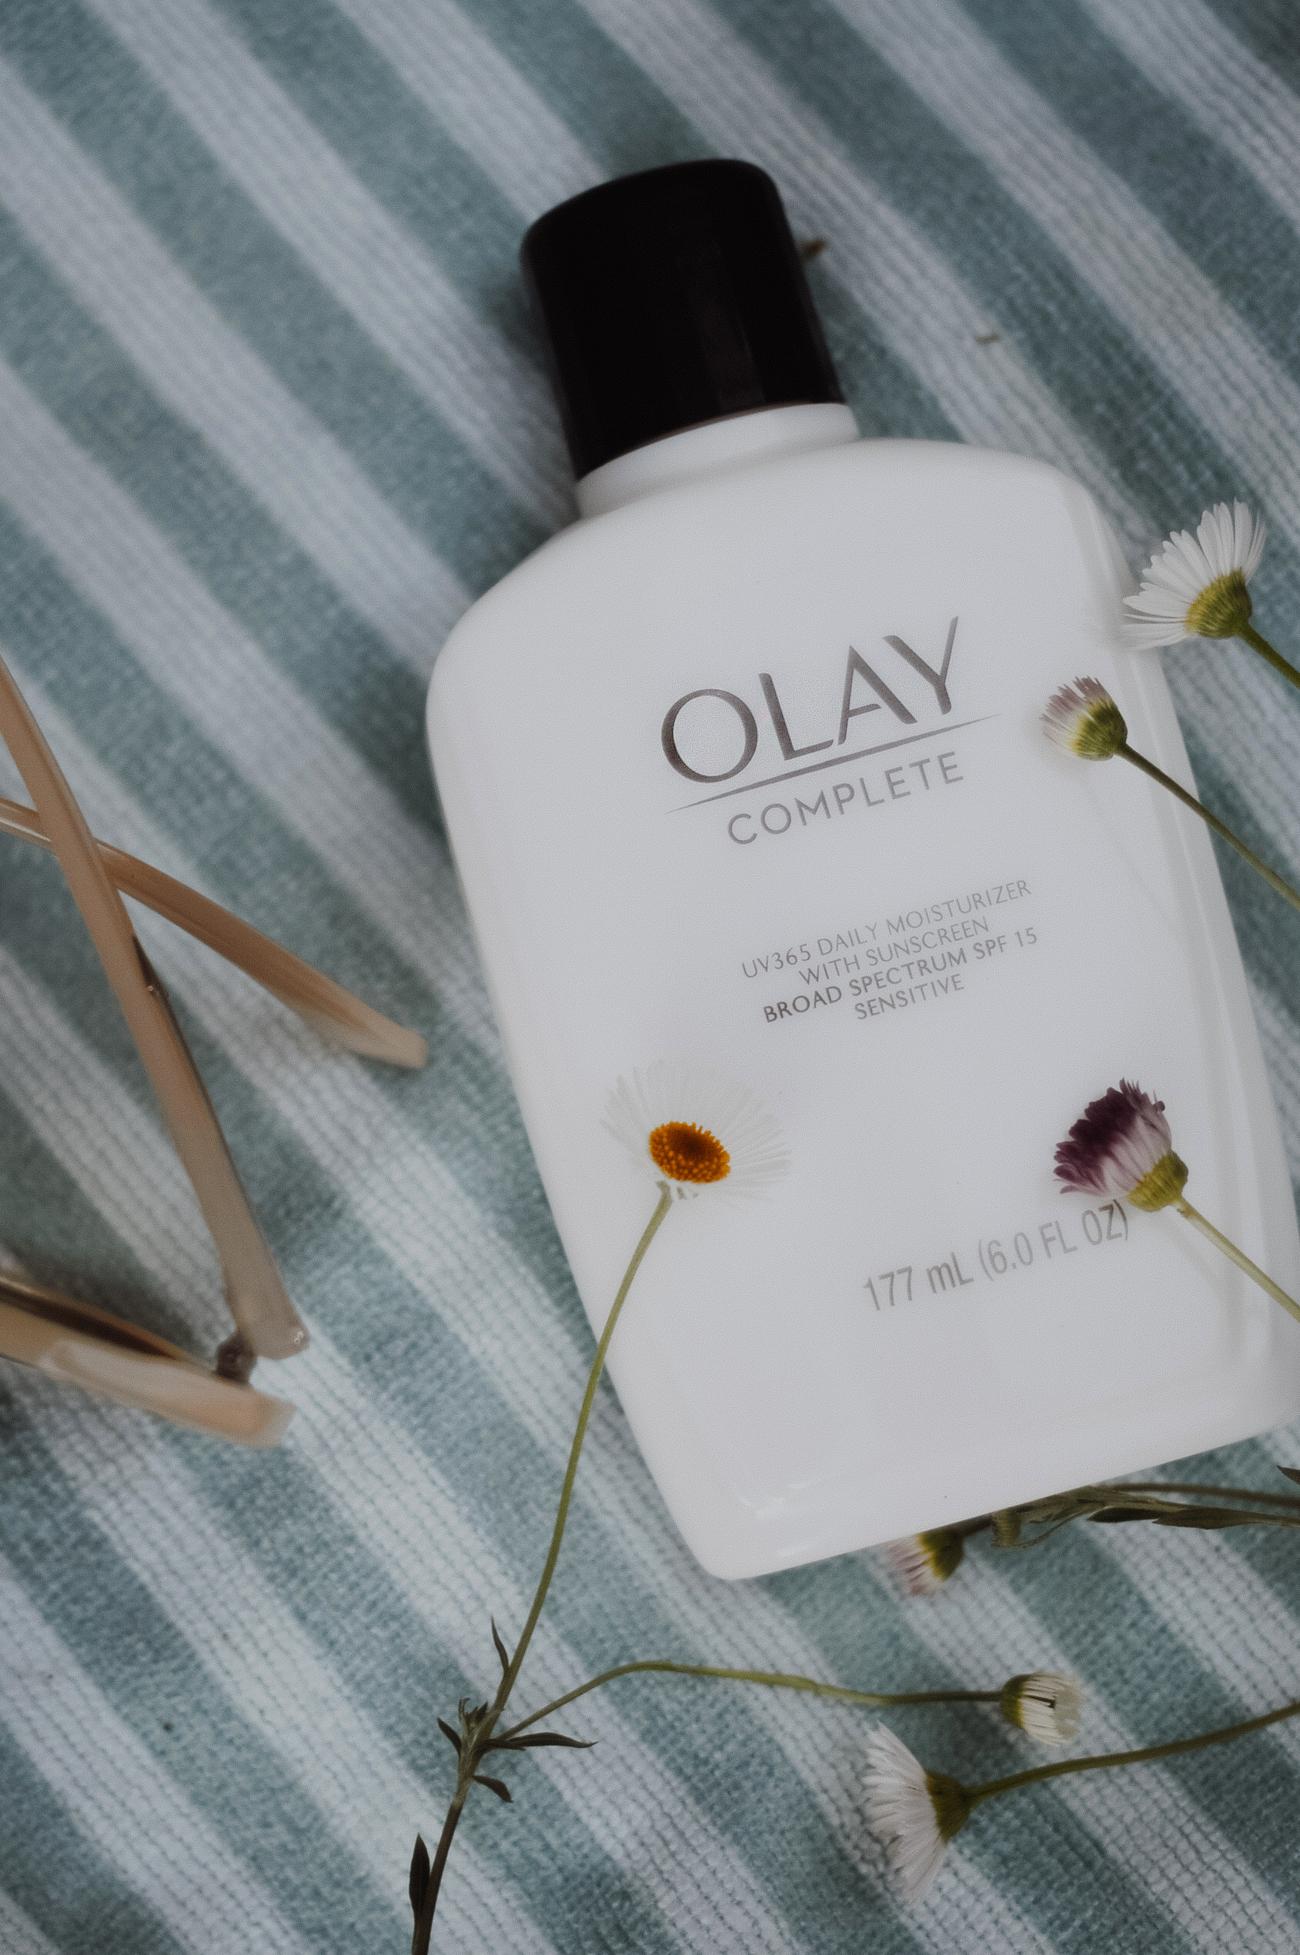 Olay SPF moisturizer blogger review via. Birdie Shoots